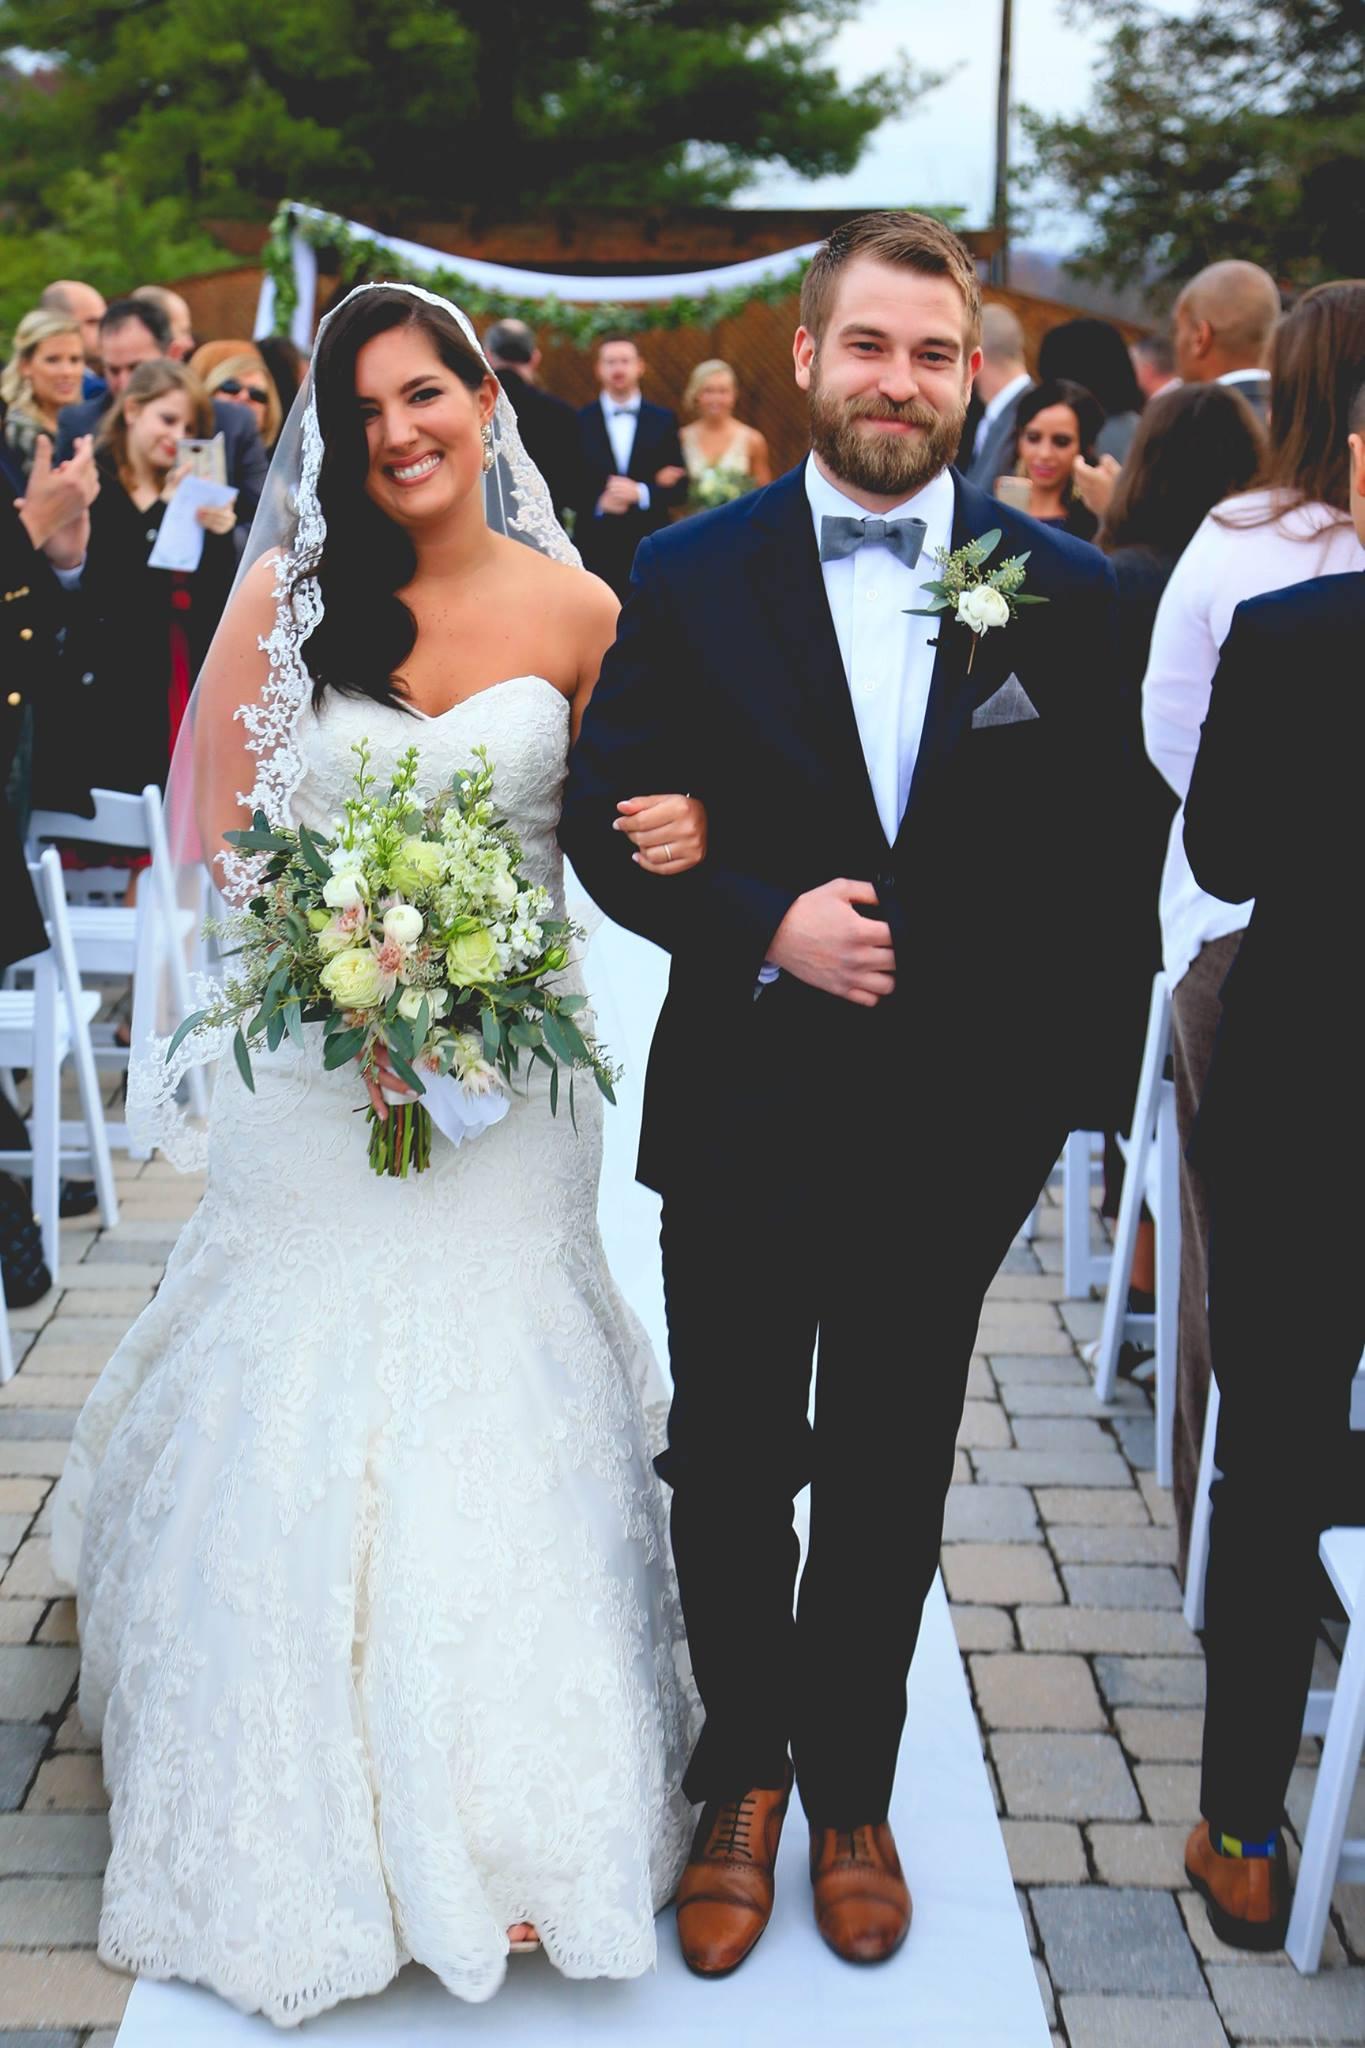 We (Still) Do: Liberty Mountain Resort Wedding Vow Renewal | Shotgunning for Love Letters